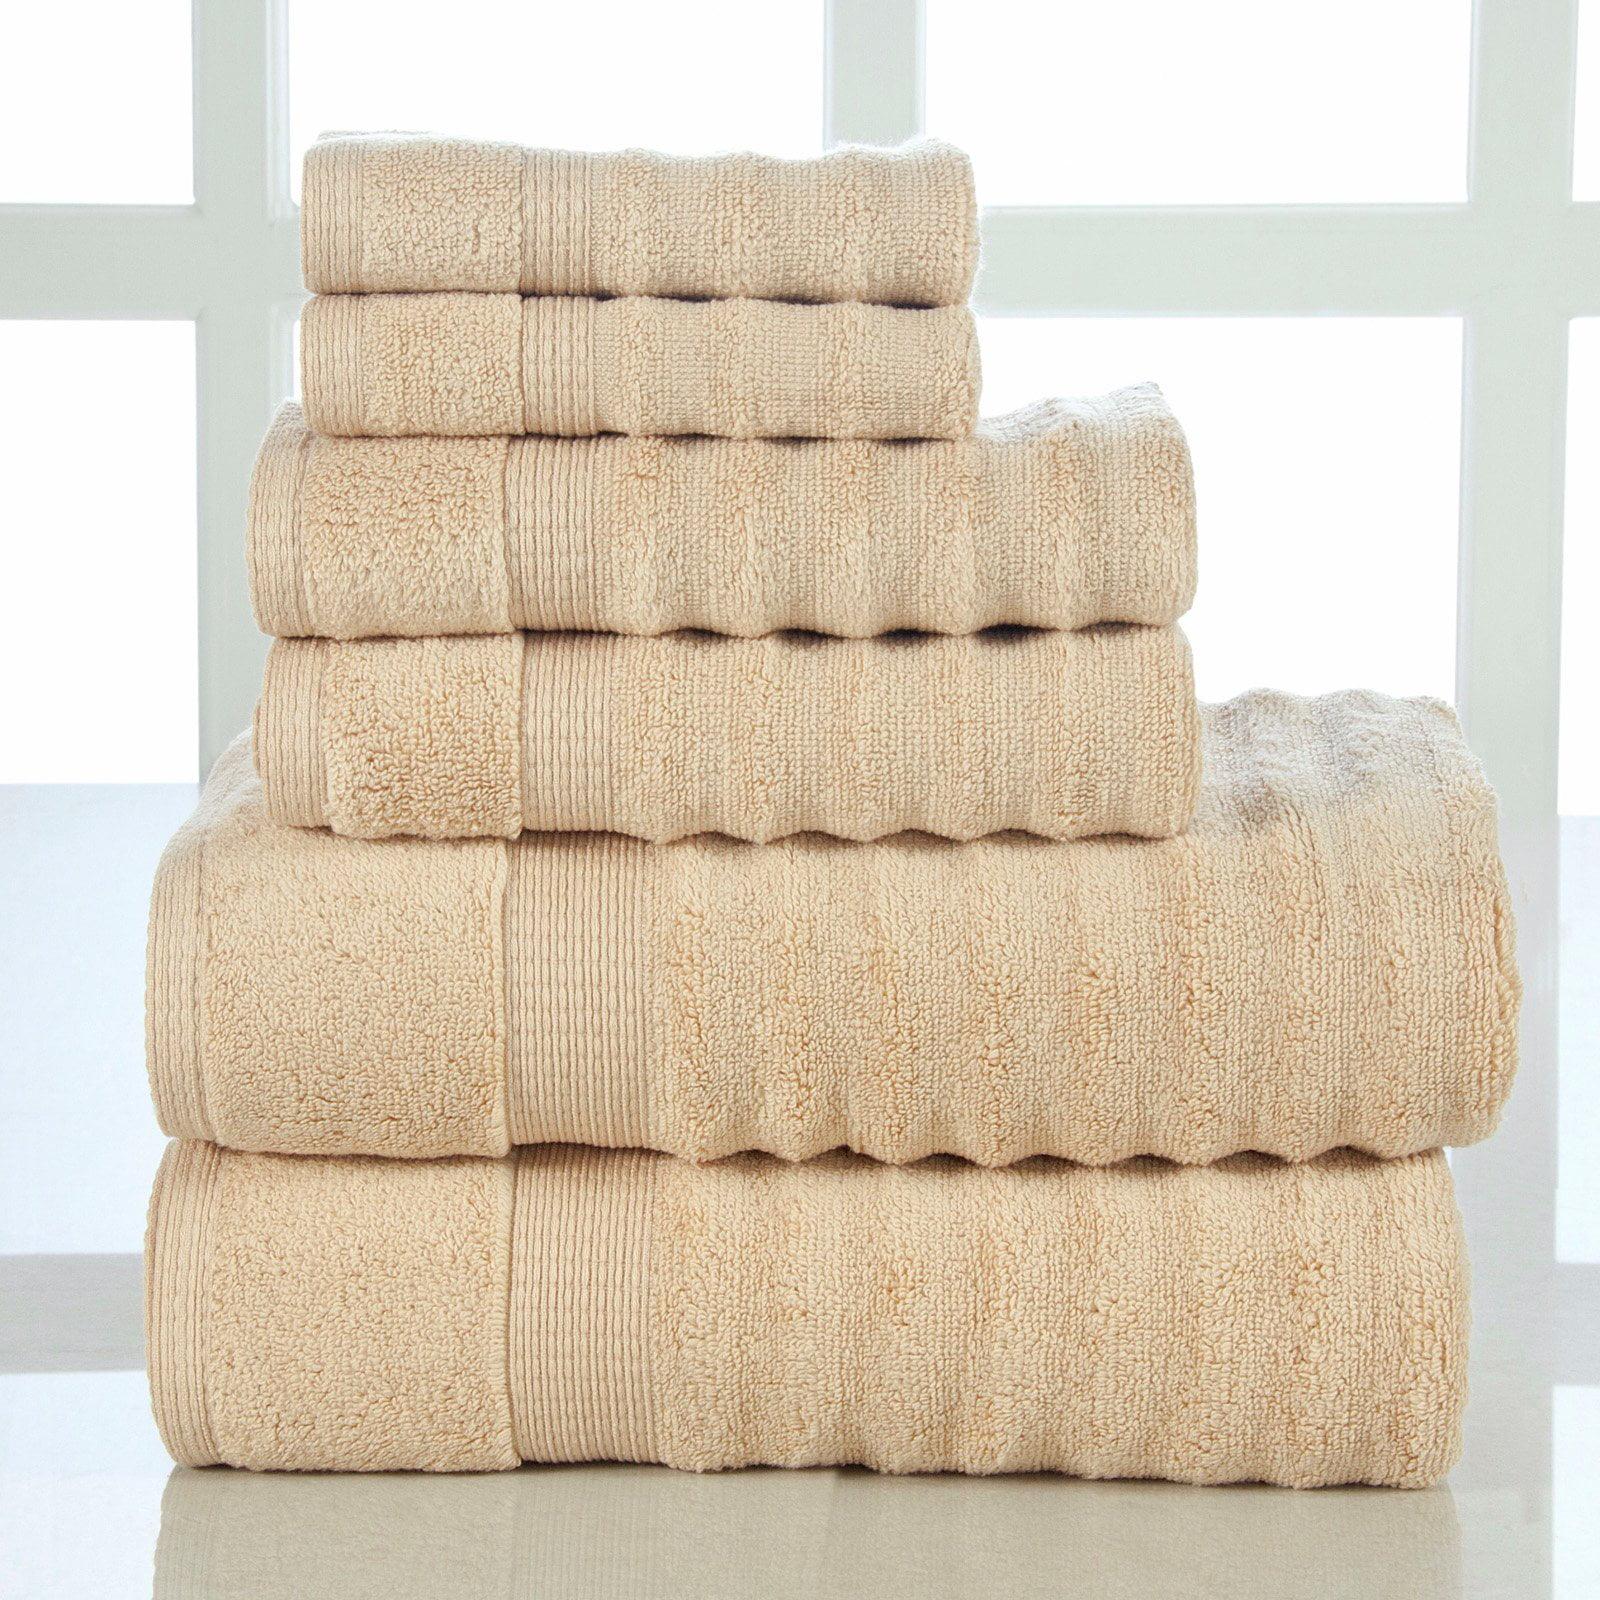 Elegance Spa 6 Piece Quick Dry Ribbed Cotton Towel Set